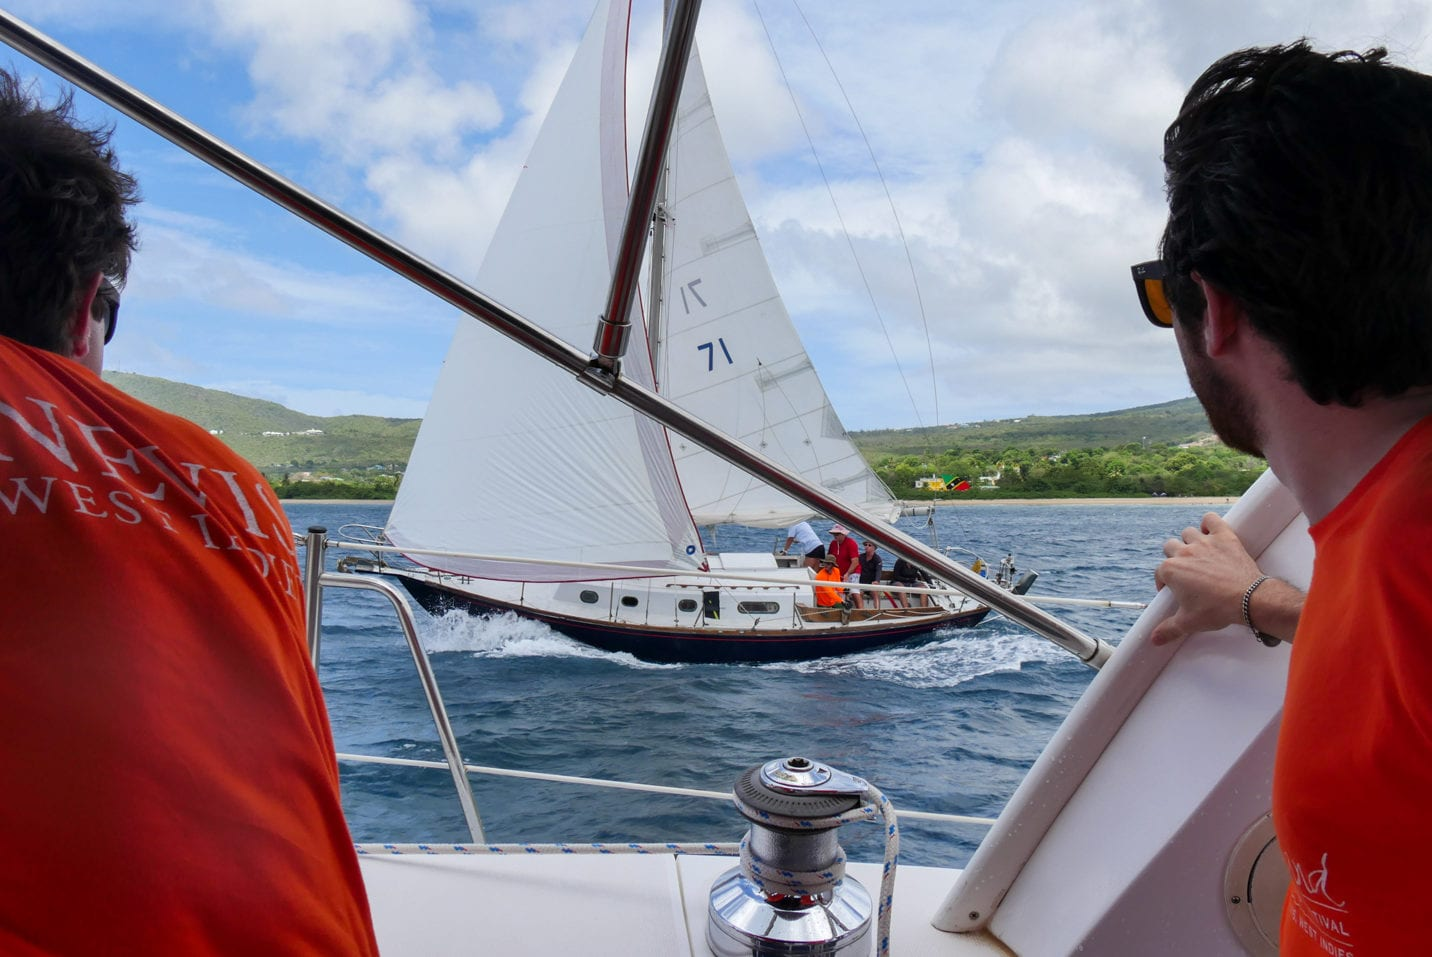 caribbean-sailing-booby-island-regatta-nevis (2)